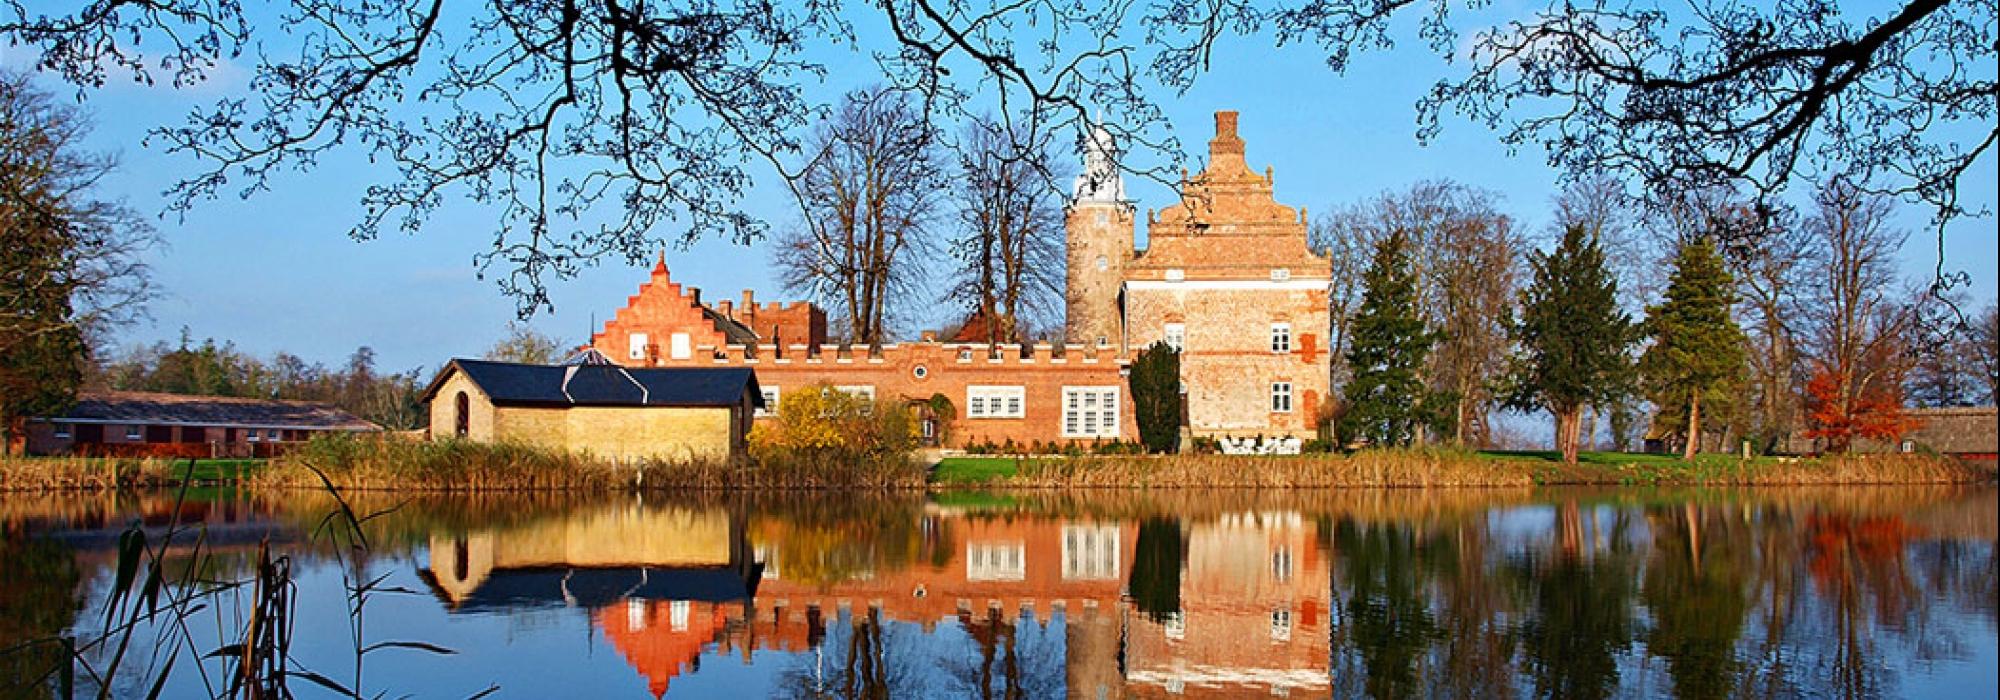 Broholm Slot